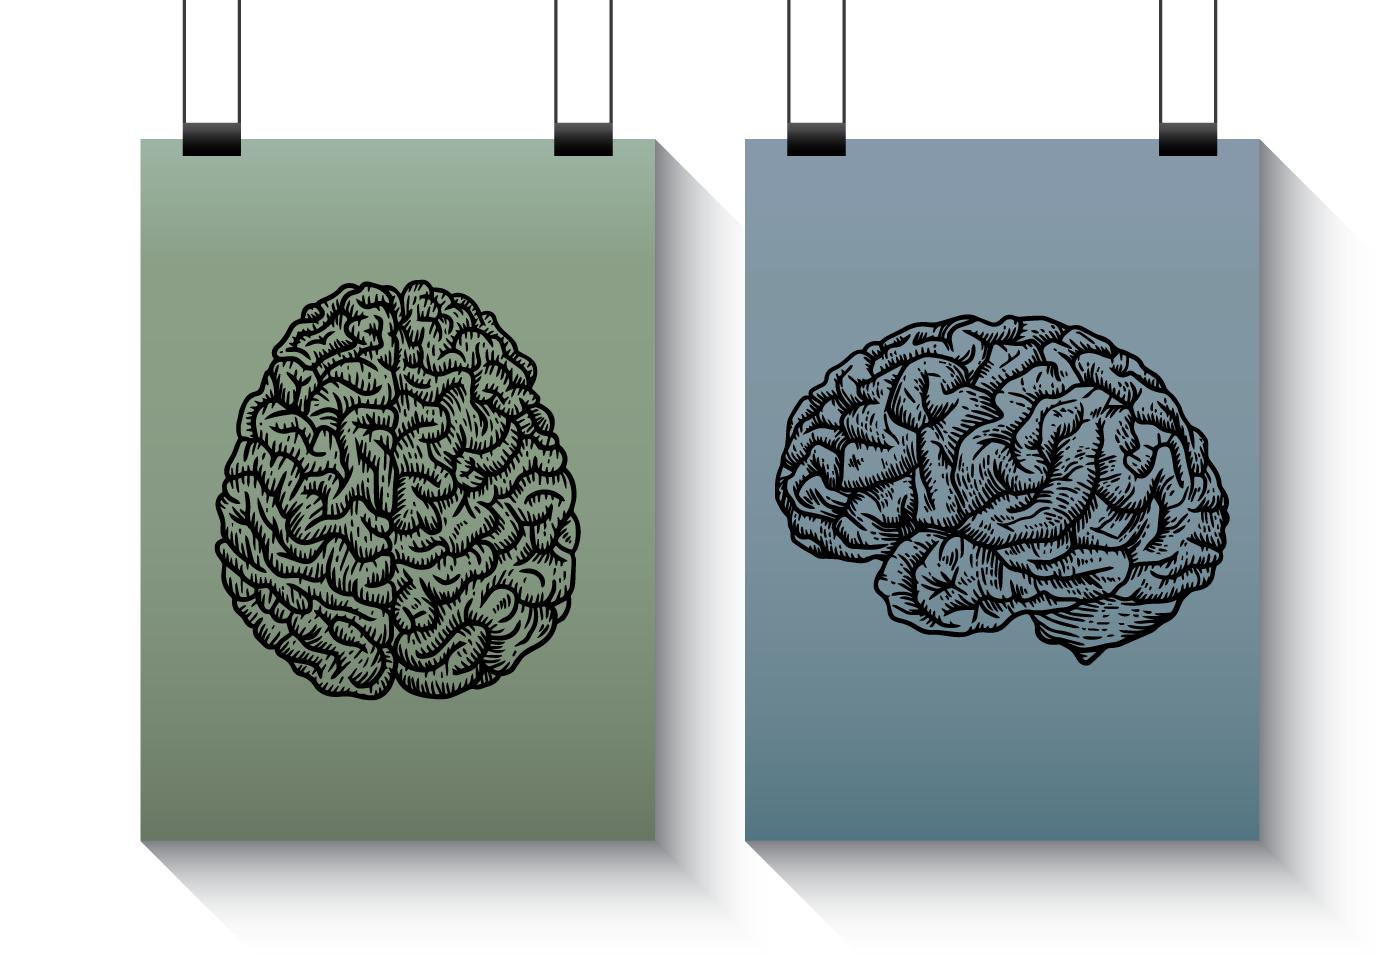 Brain Anatomy Free Vector Art - (555 Free Downloads)